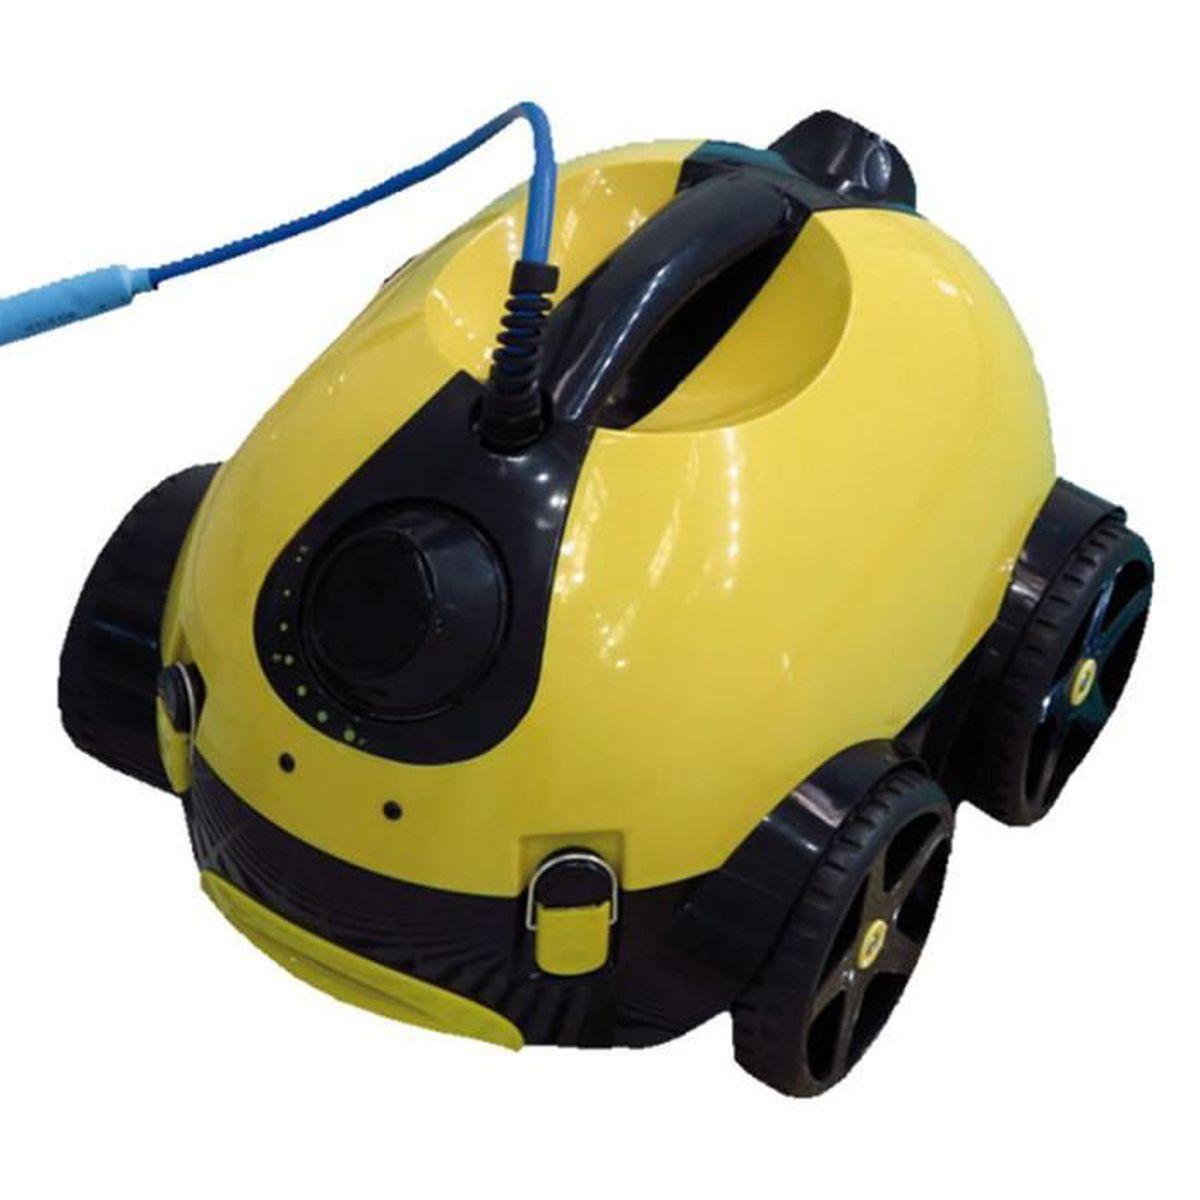 Robot Nettoyeur Piscine Kokido Turbo-Klean - Achat / Vente ... concernant Robot Piscine Cdiscount